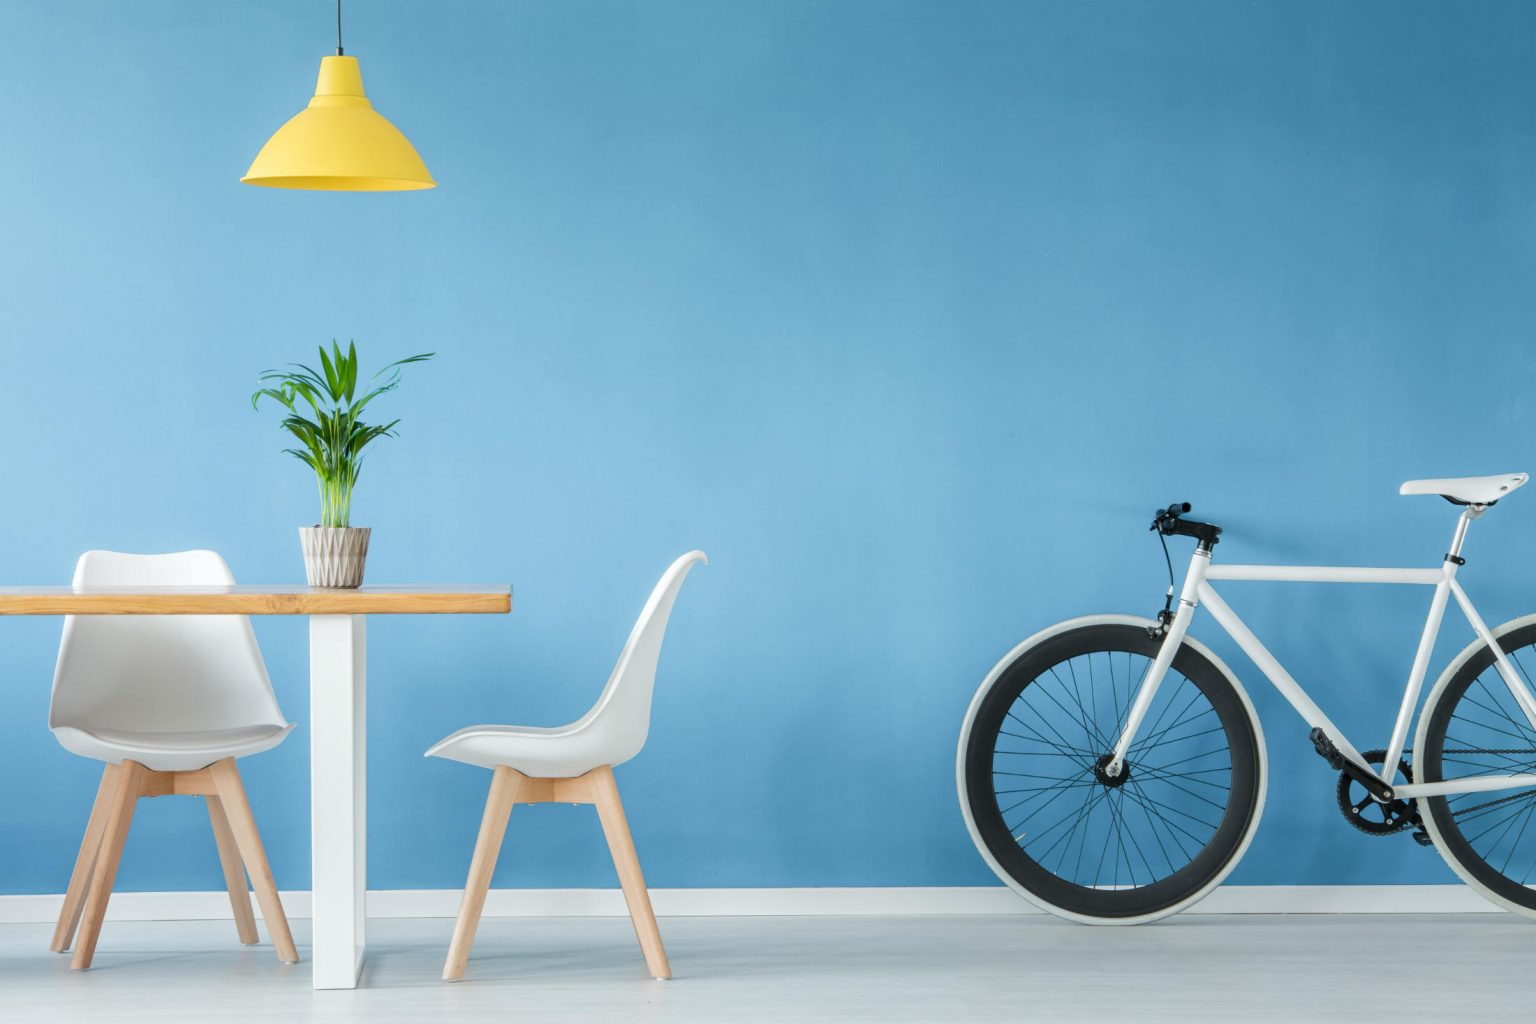 minimal-interior-with-furniture-P8X647W.jpg